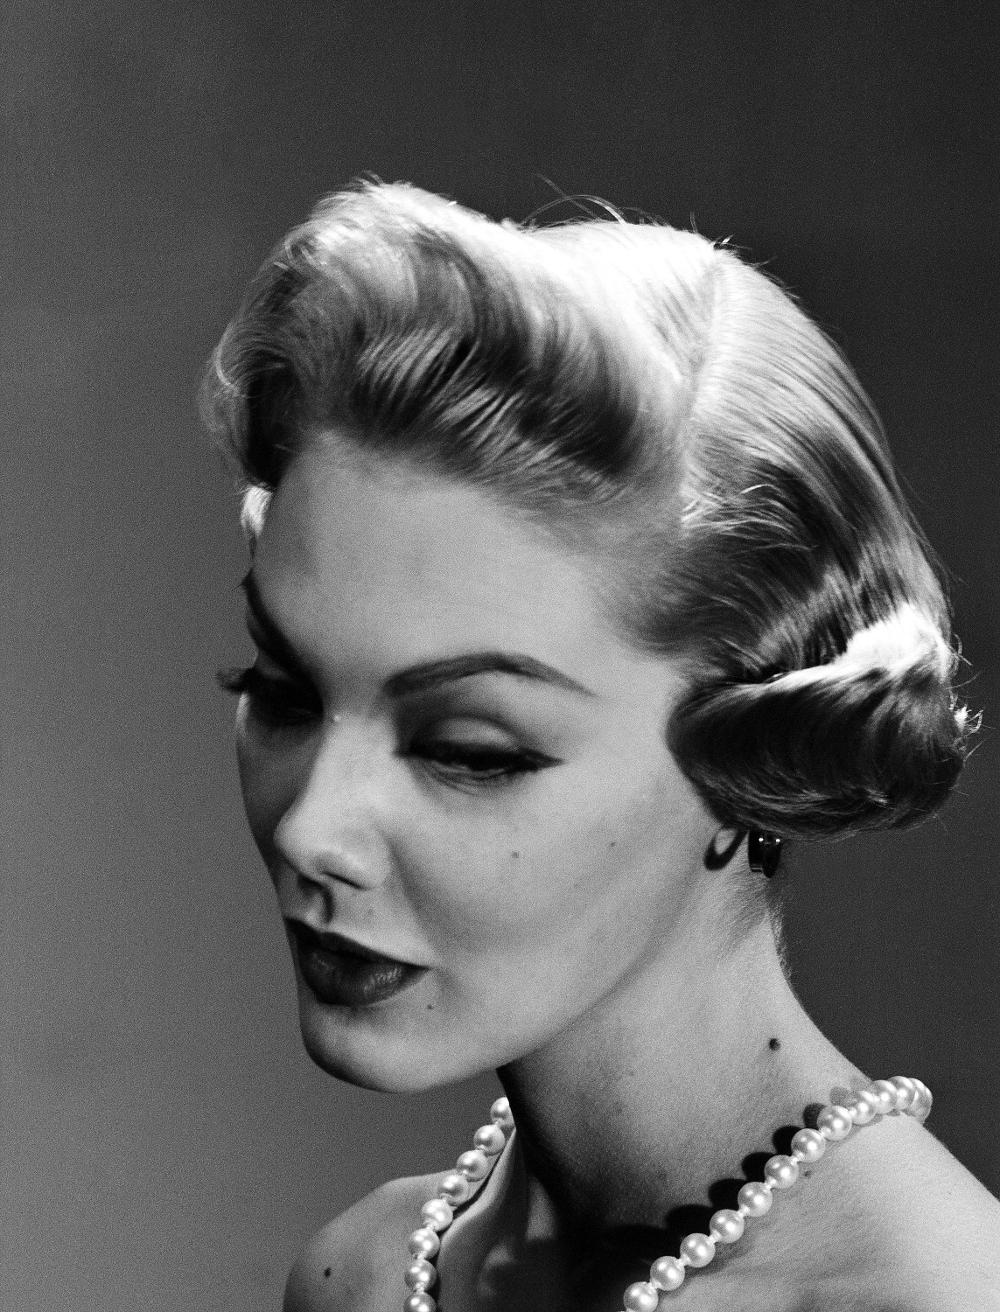 mallia 1957